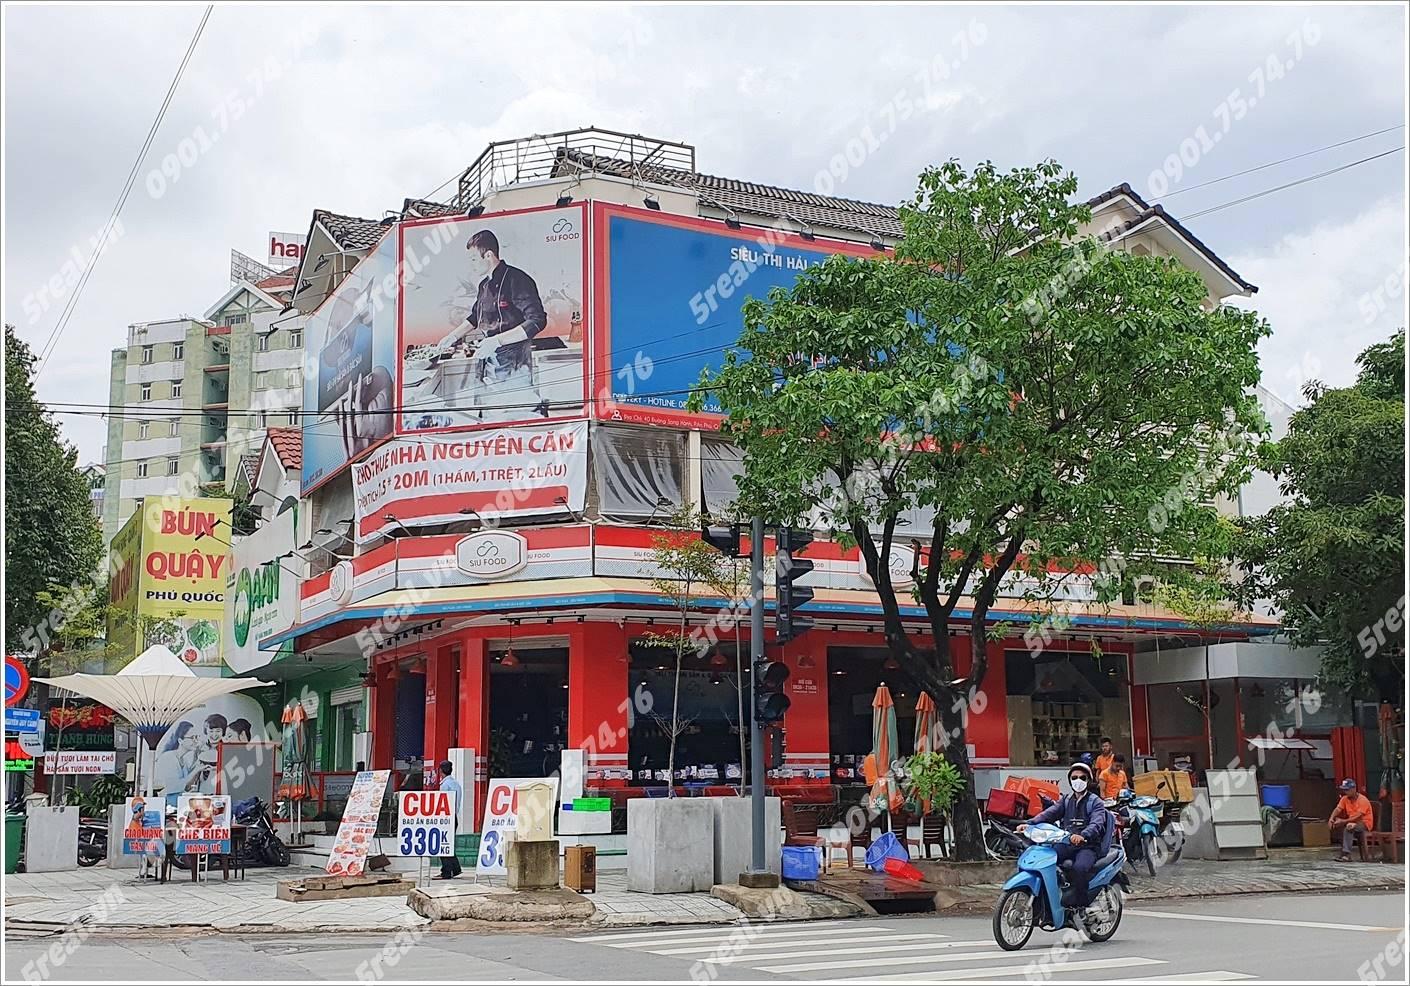 building-40-song-hanh-quan-2-van-phong-cho-thue-5real.vn-01